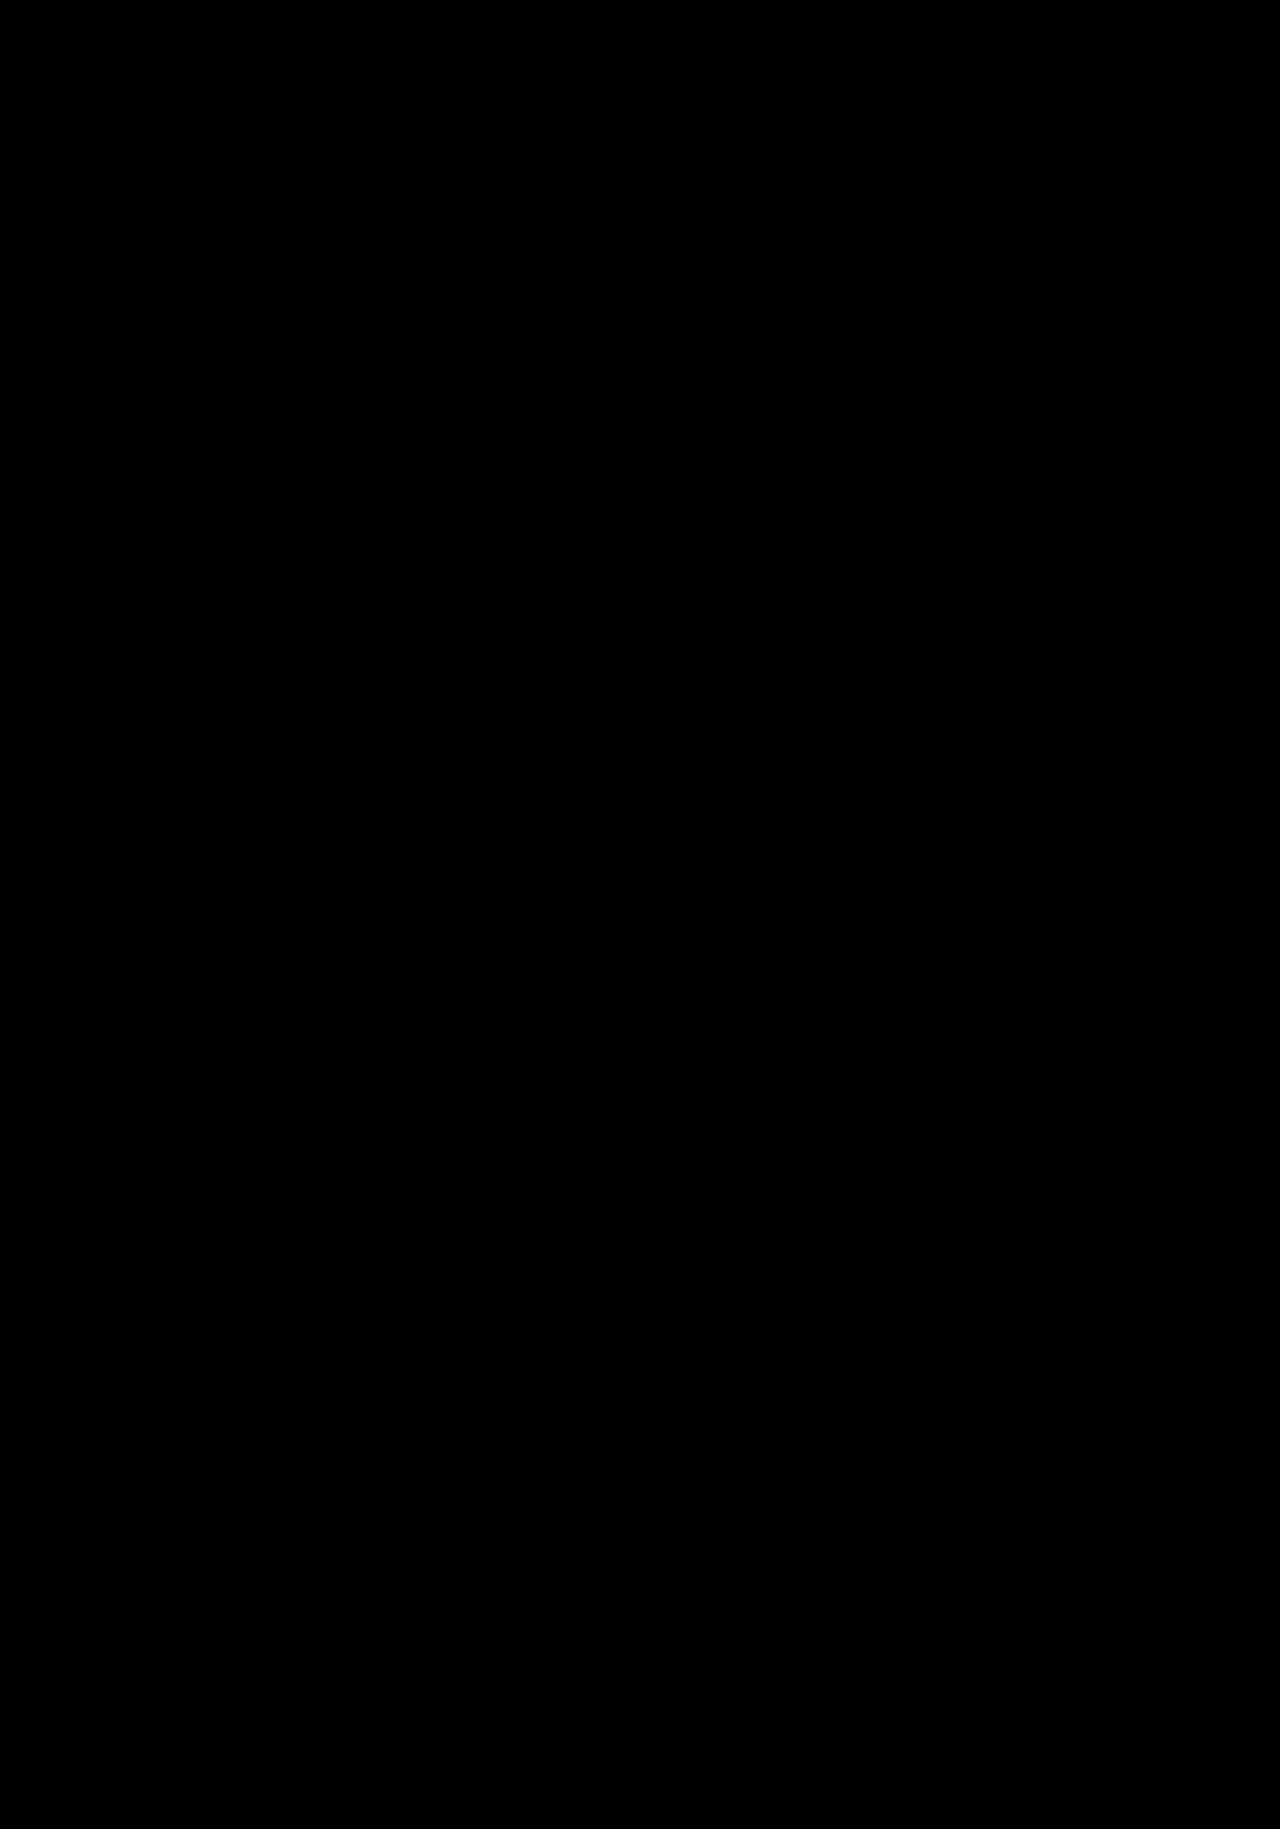 CHALDEA MANIA - Shuten Douji 2